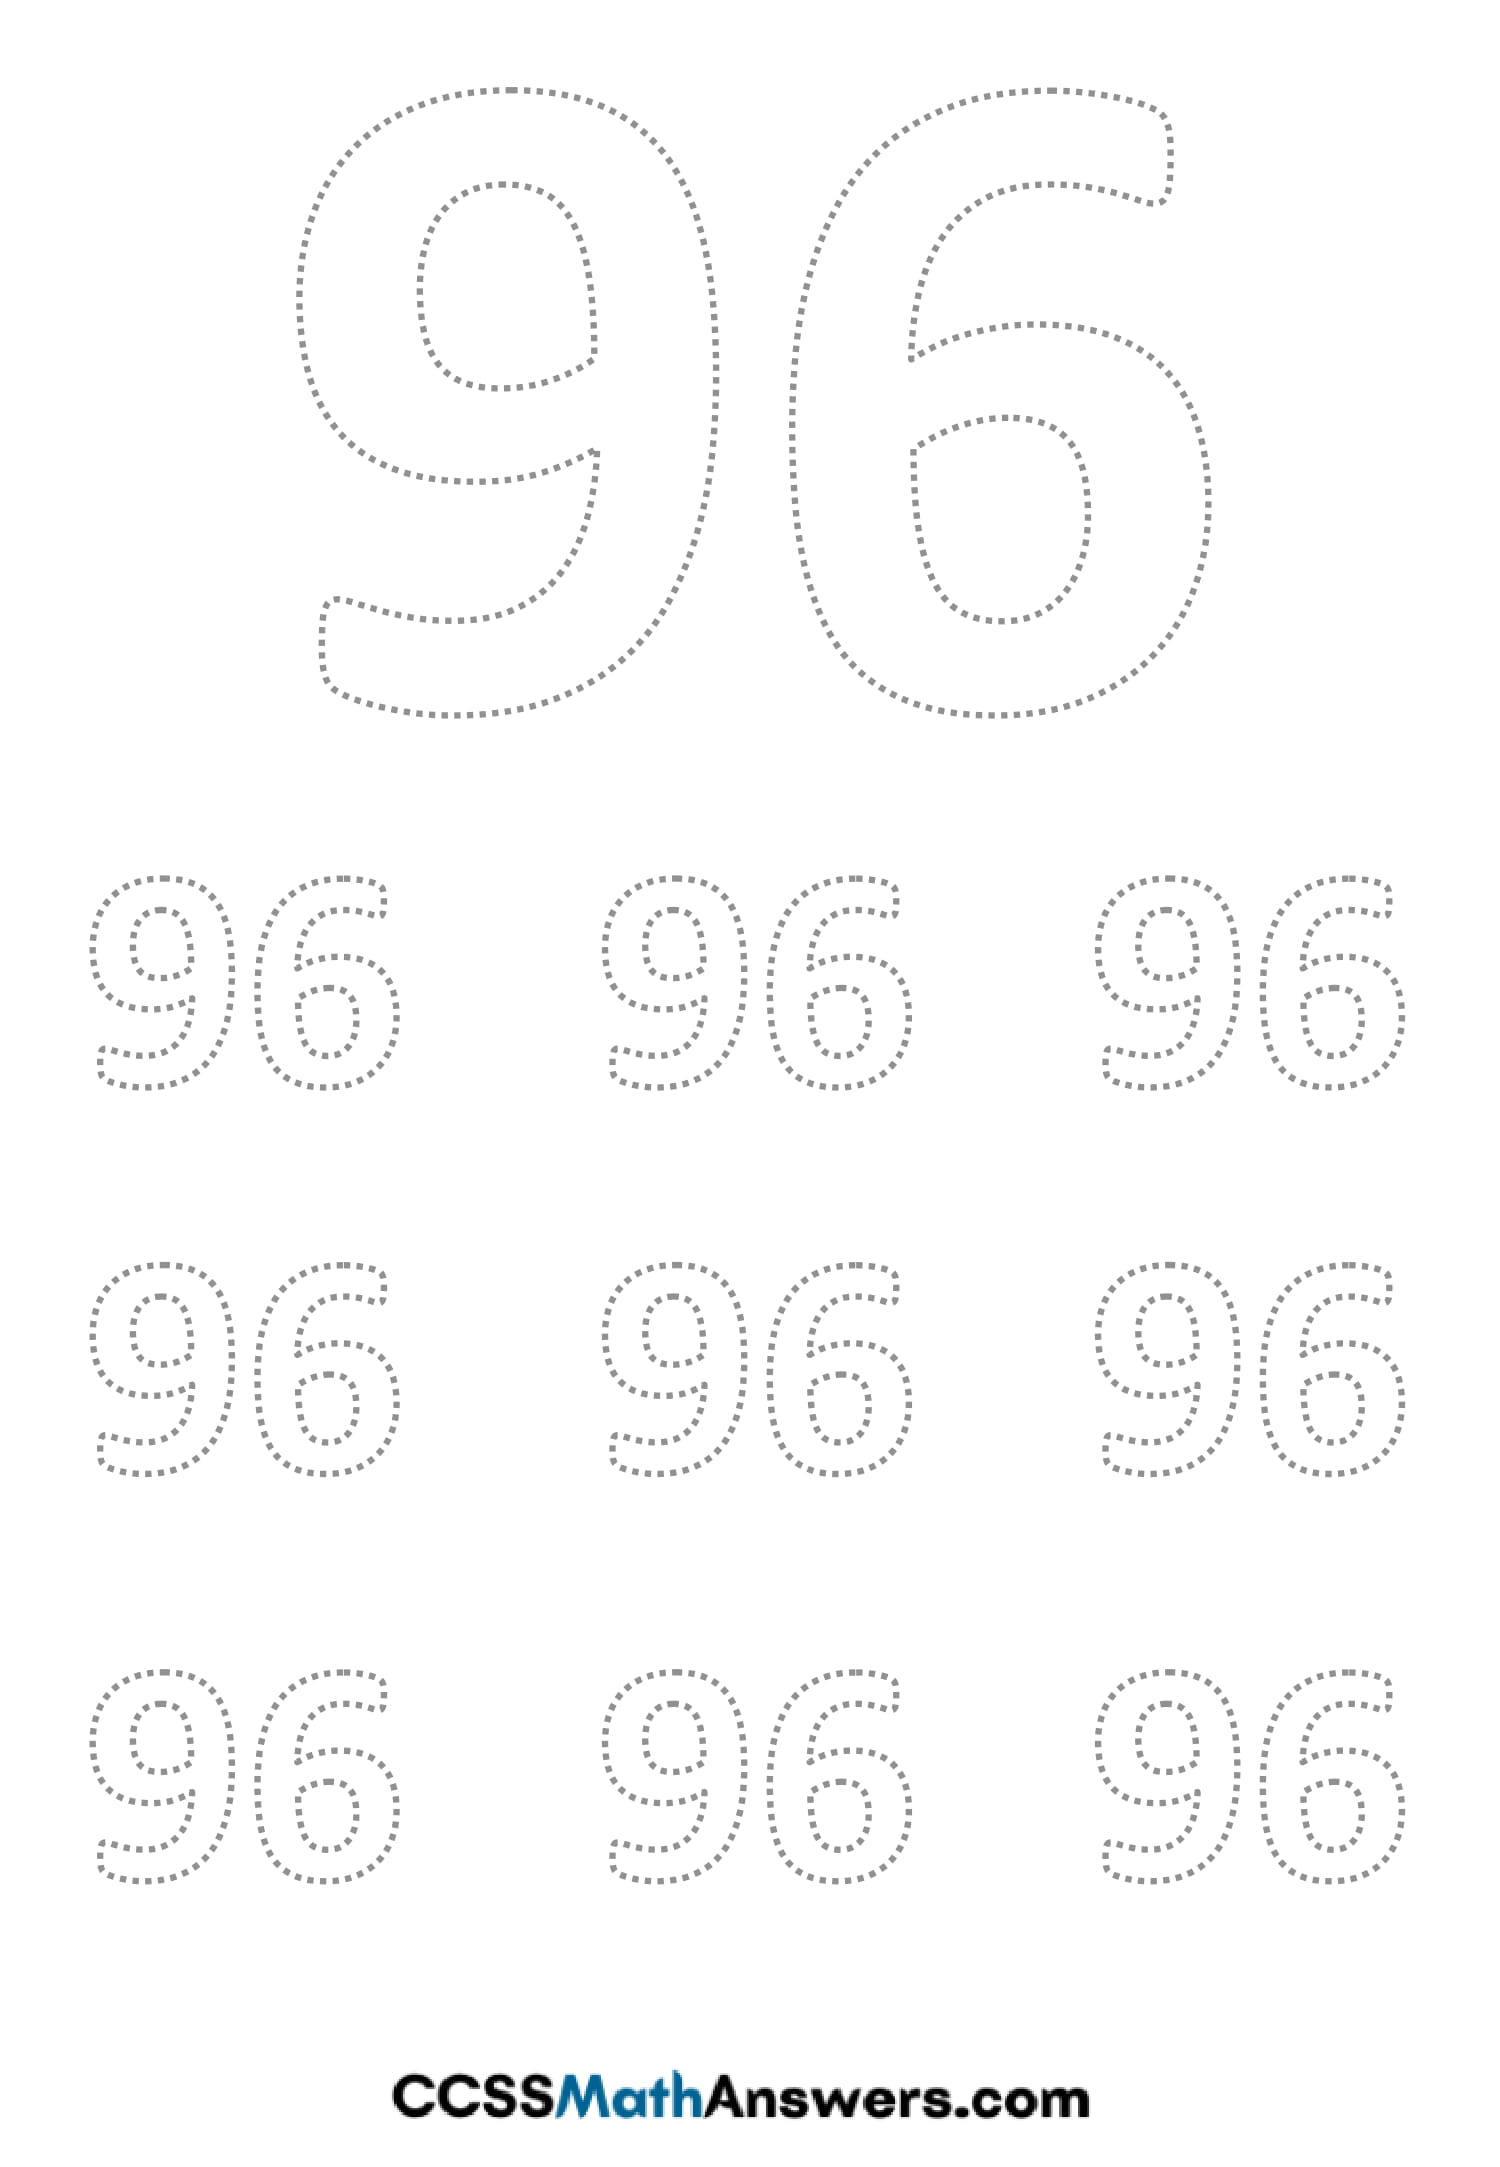 Worksheet on Number Ninty Six